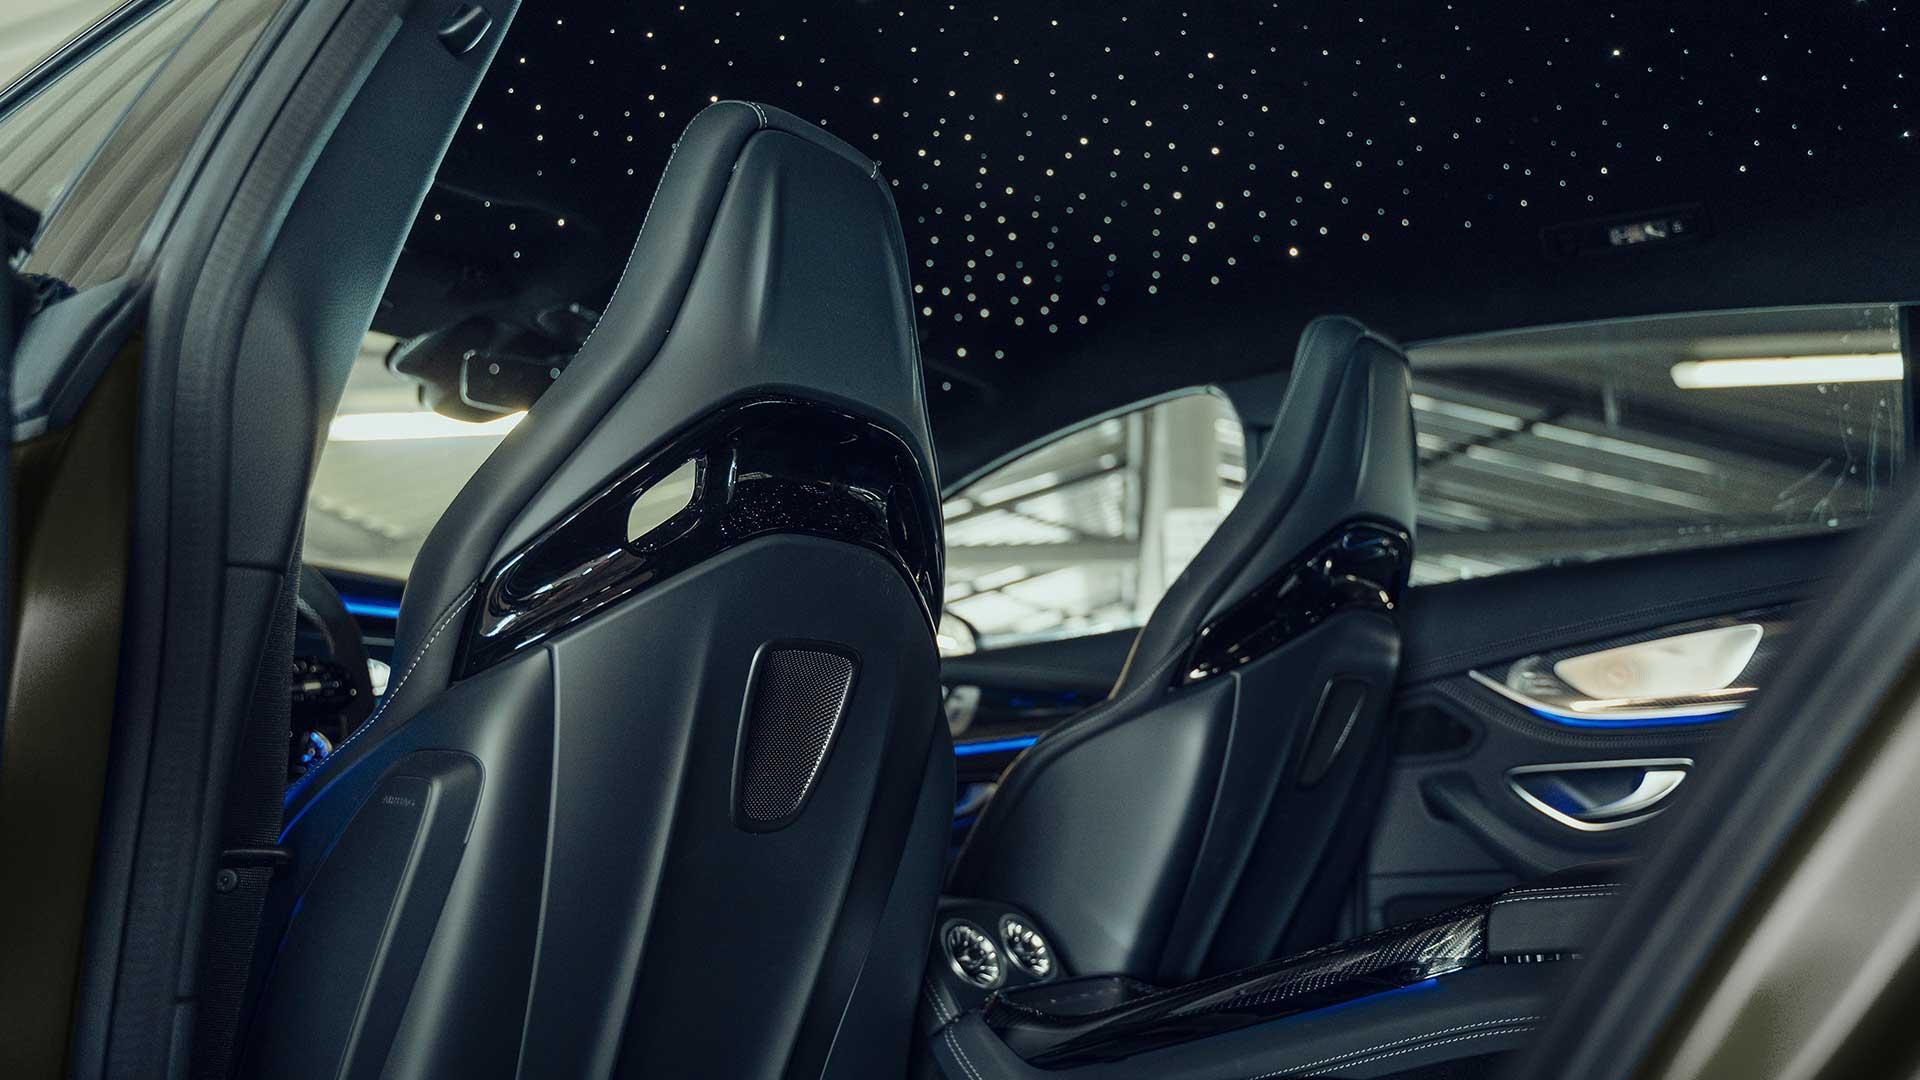 Sterrenhemel Fostla Brabus 800 (Mercedes-AMG GT 63 4-Door Coupé)